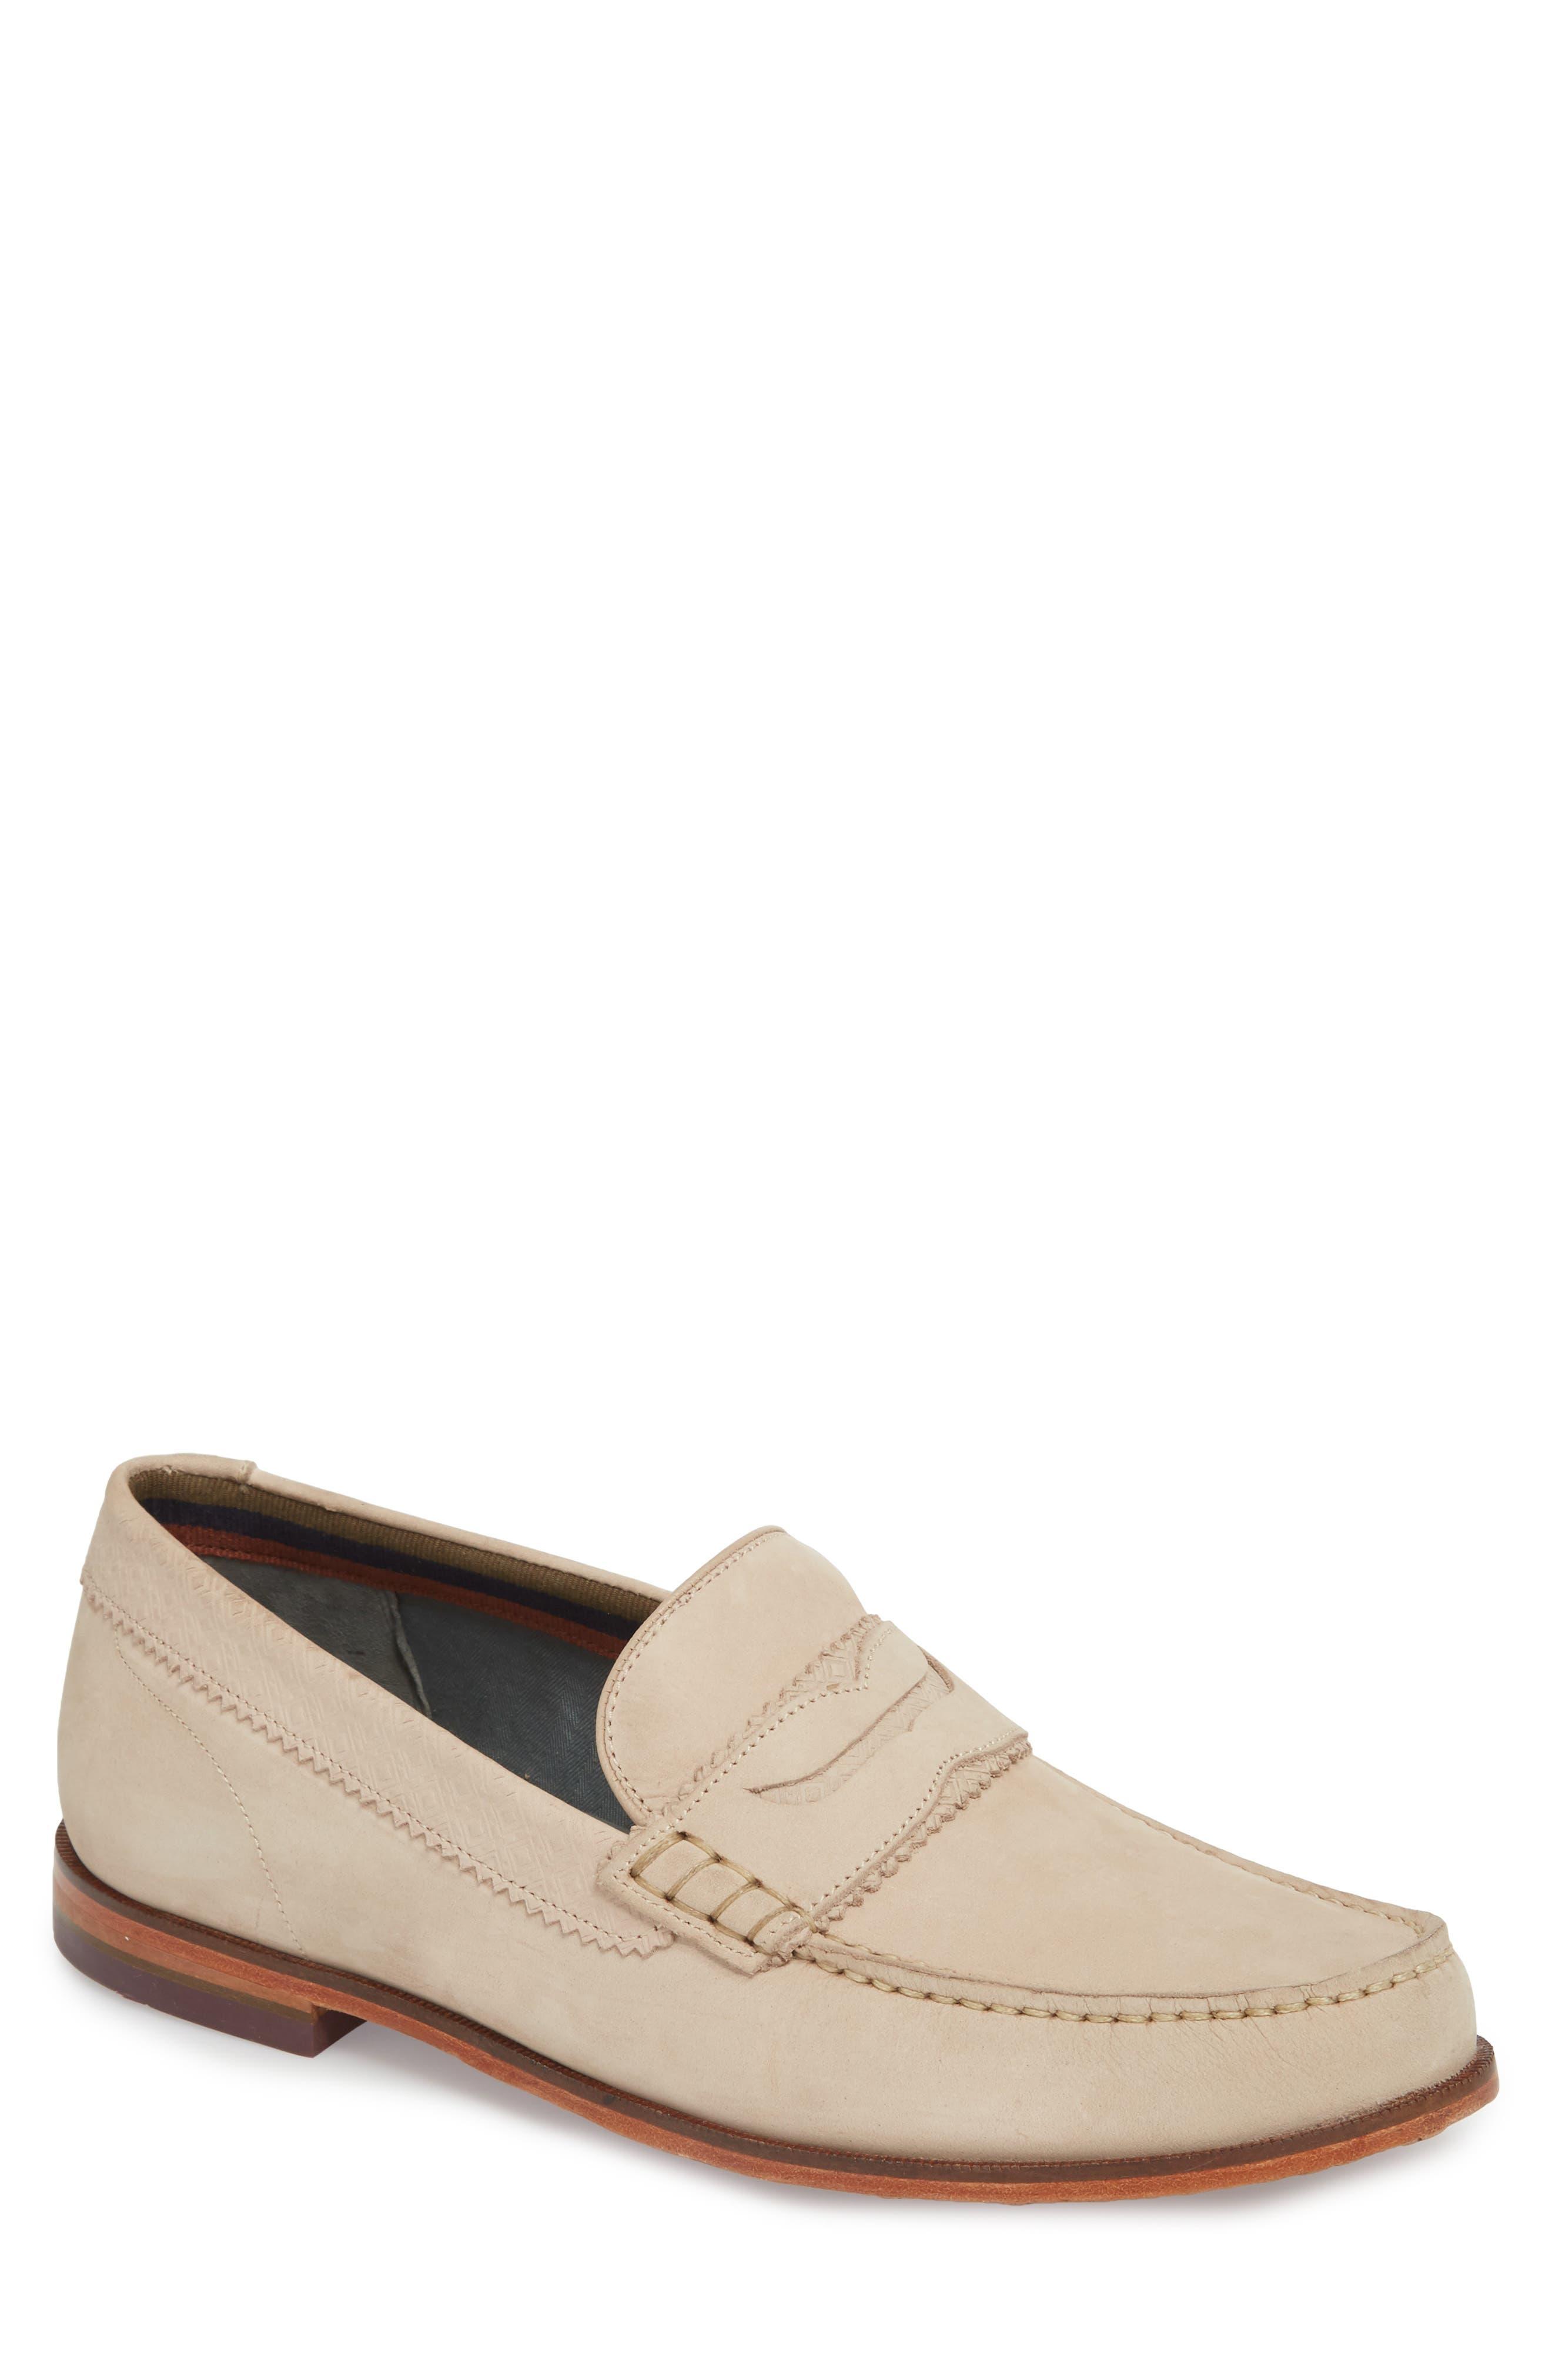 Miicke 6 Penny Loafer,                         Main,                         color, Light Tan Nubuck